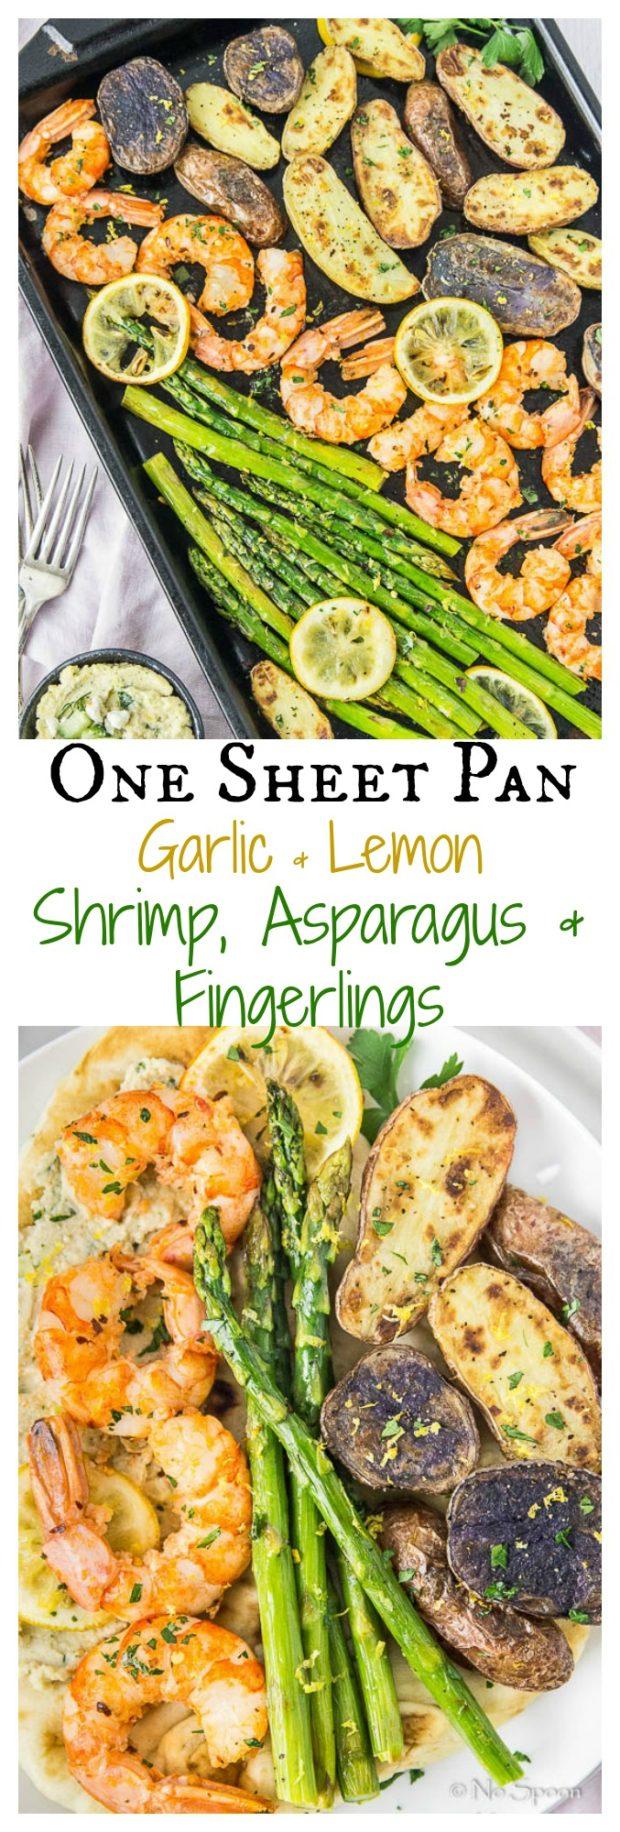 Sheet Pan Garlic & Lemon Shrimp, Asparagus & Fingerling Potatoes- long pin1